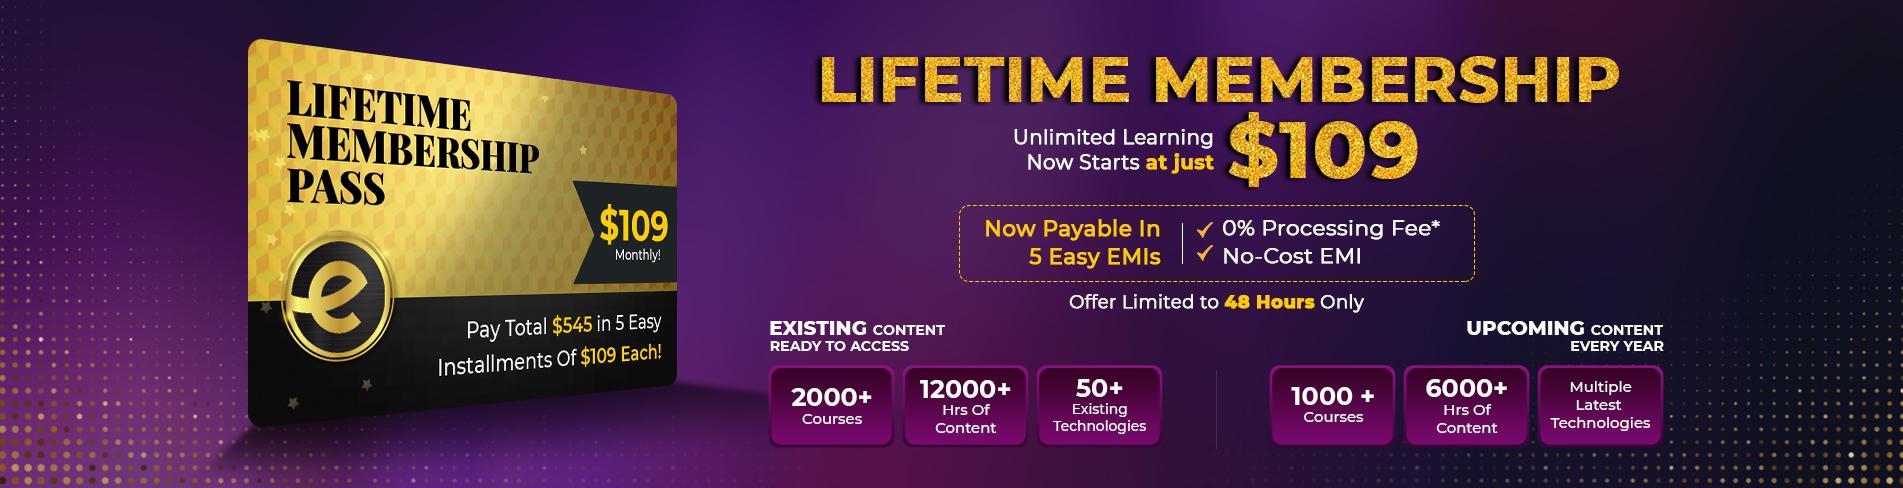 Eduonix lifetime learning access